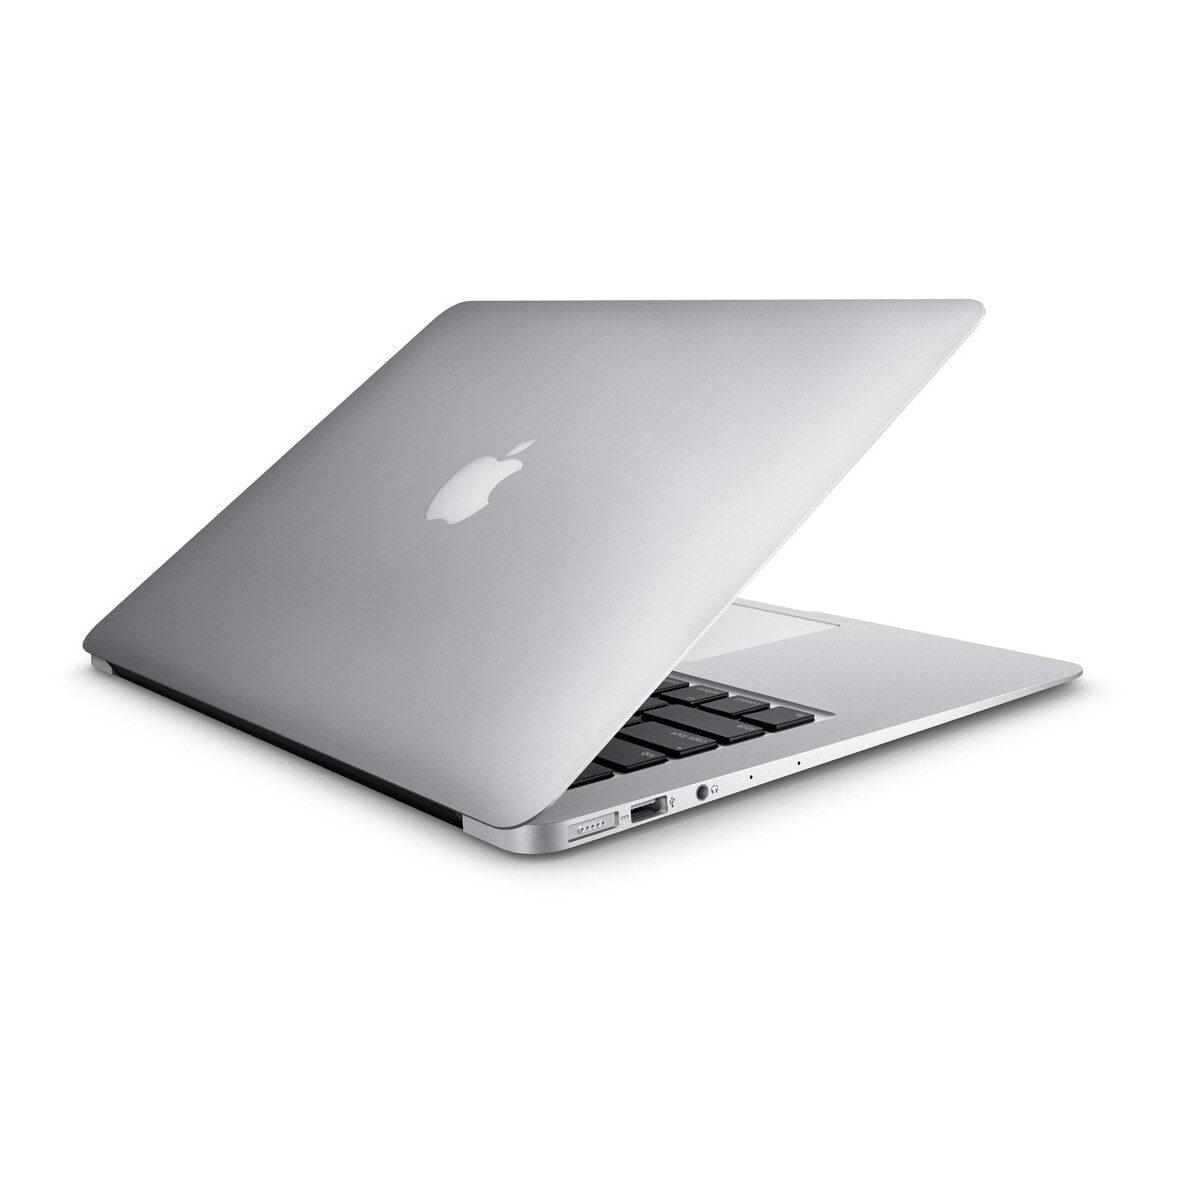 "Apple Macbook Air 13.3"" Powerful Core i5 128GB SSD Solid State 4GB Ram Mac Laptop OS Mojave"